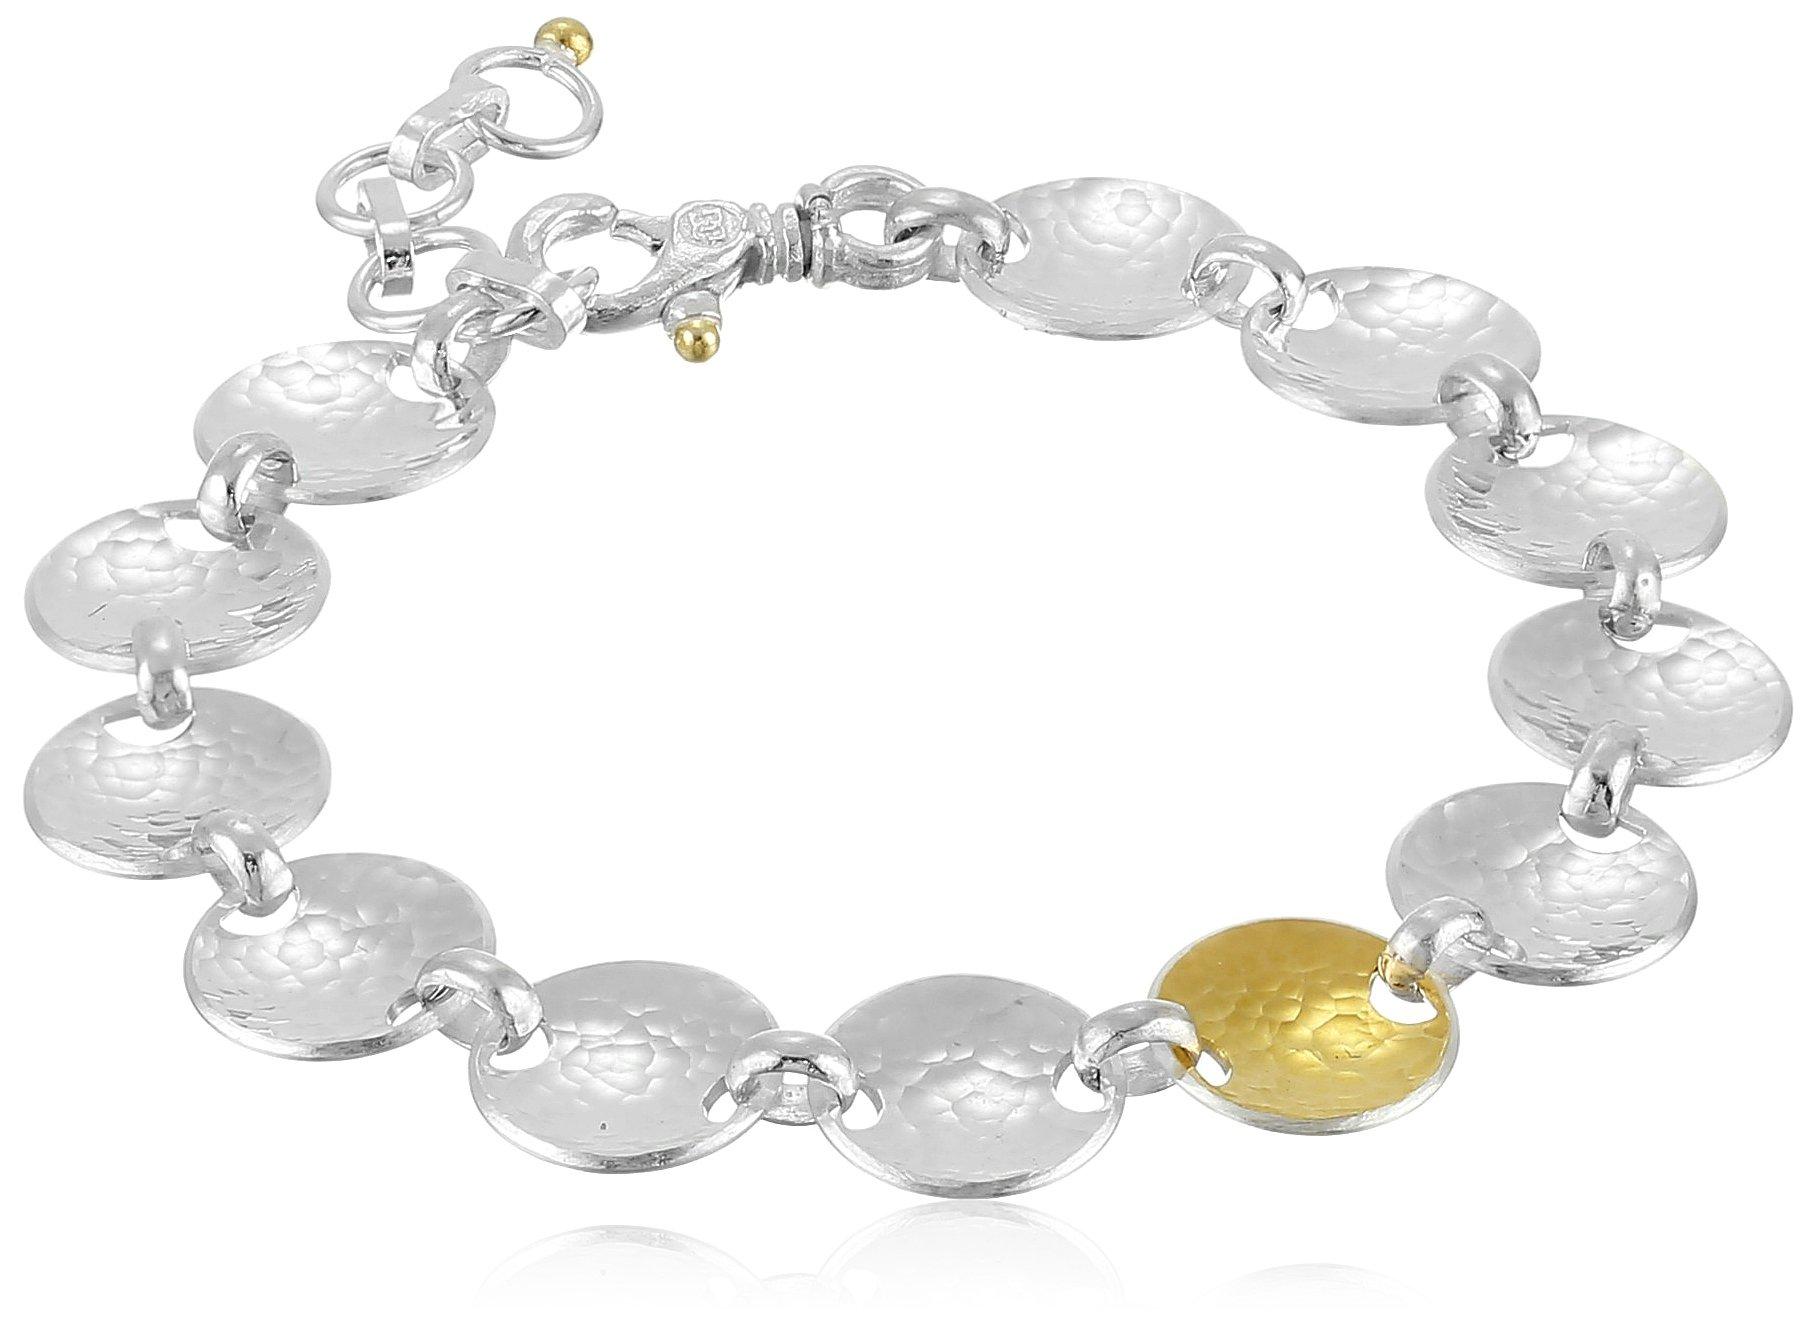 GURHAN Hourglass Sterling Silver Soft Bracelet, 8'' + 1.5'' Extender by Gurhan